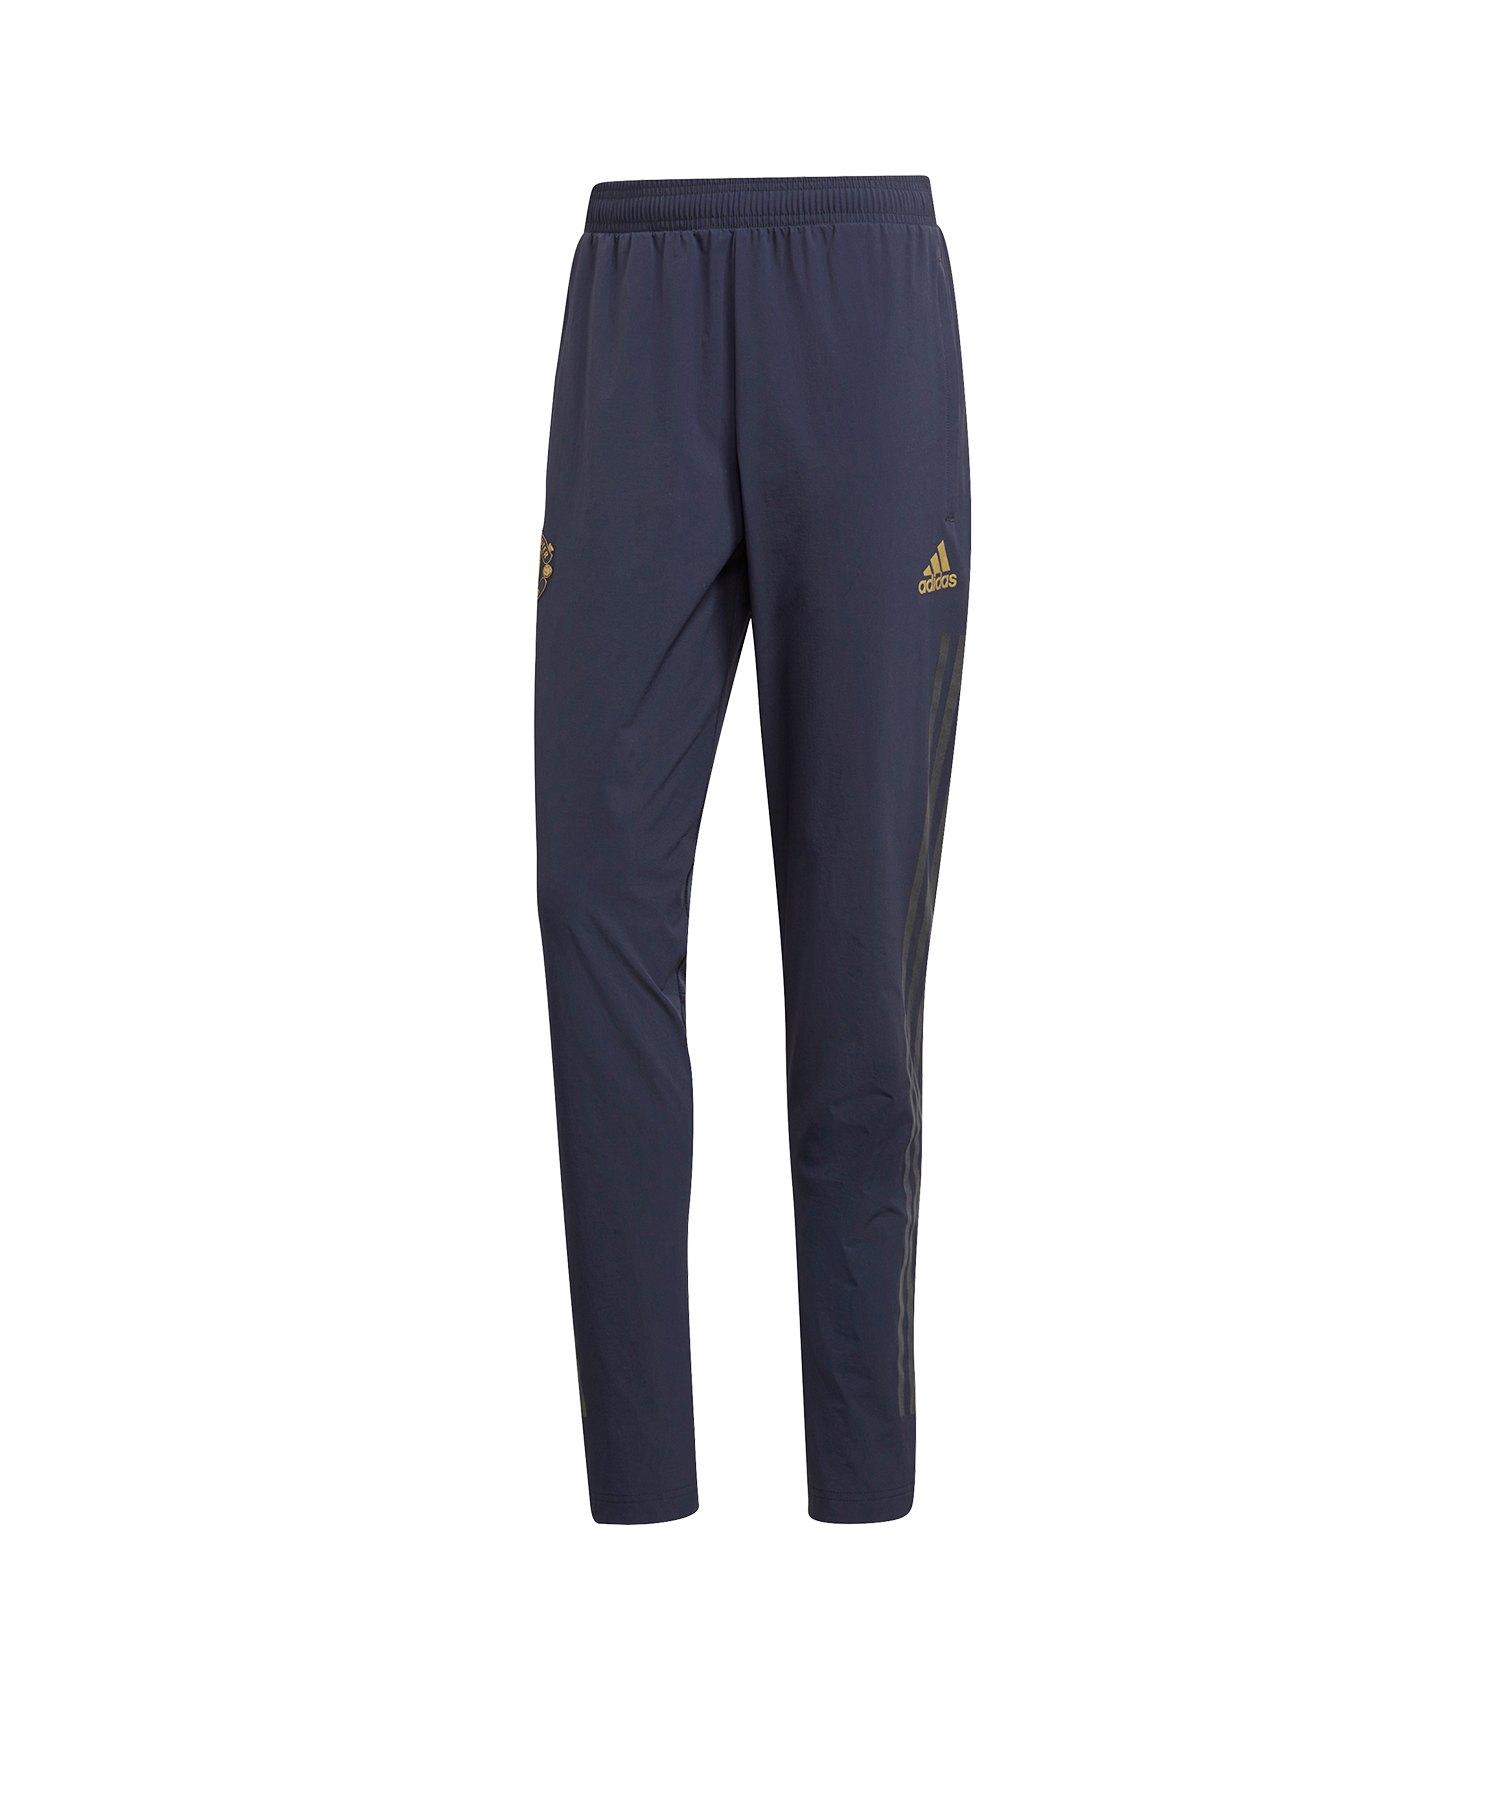 216d24437540b1 adidas Manchester United Trainingshose Pant Blau - blau